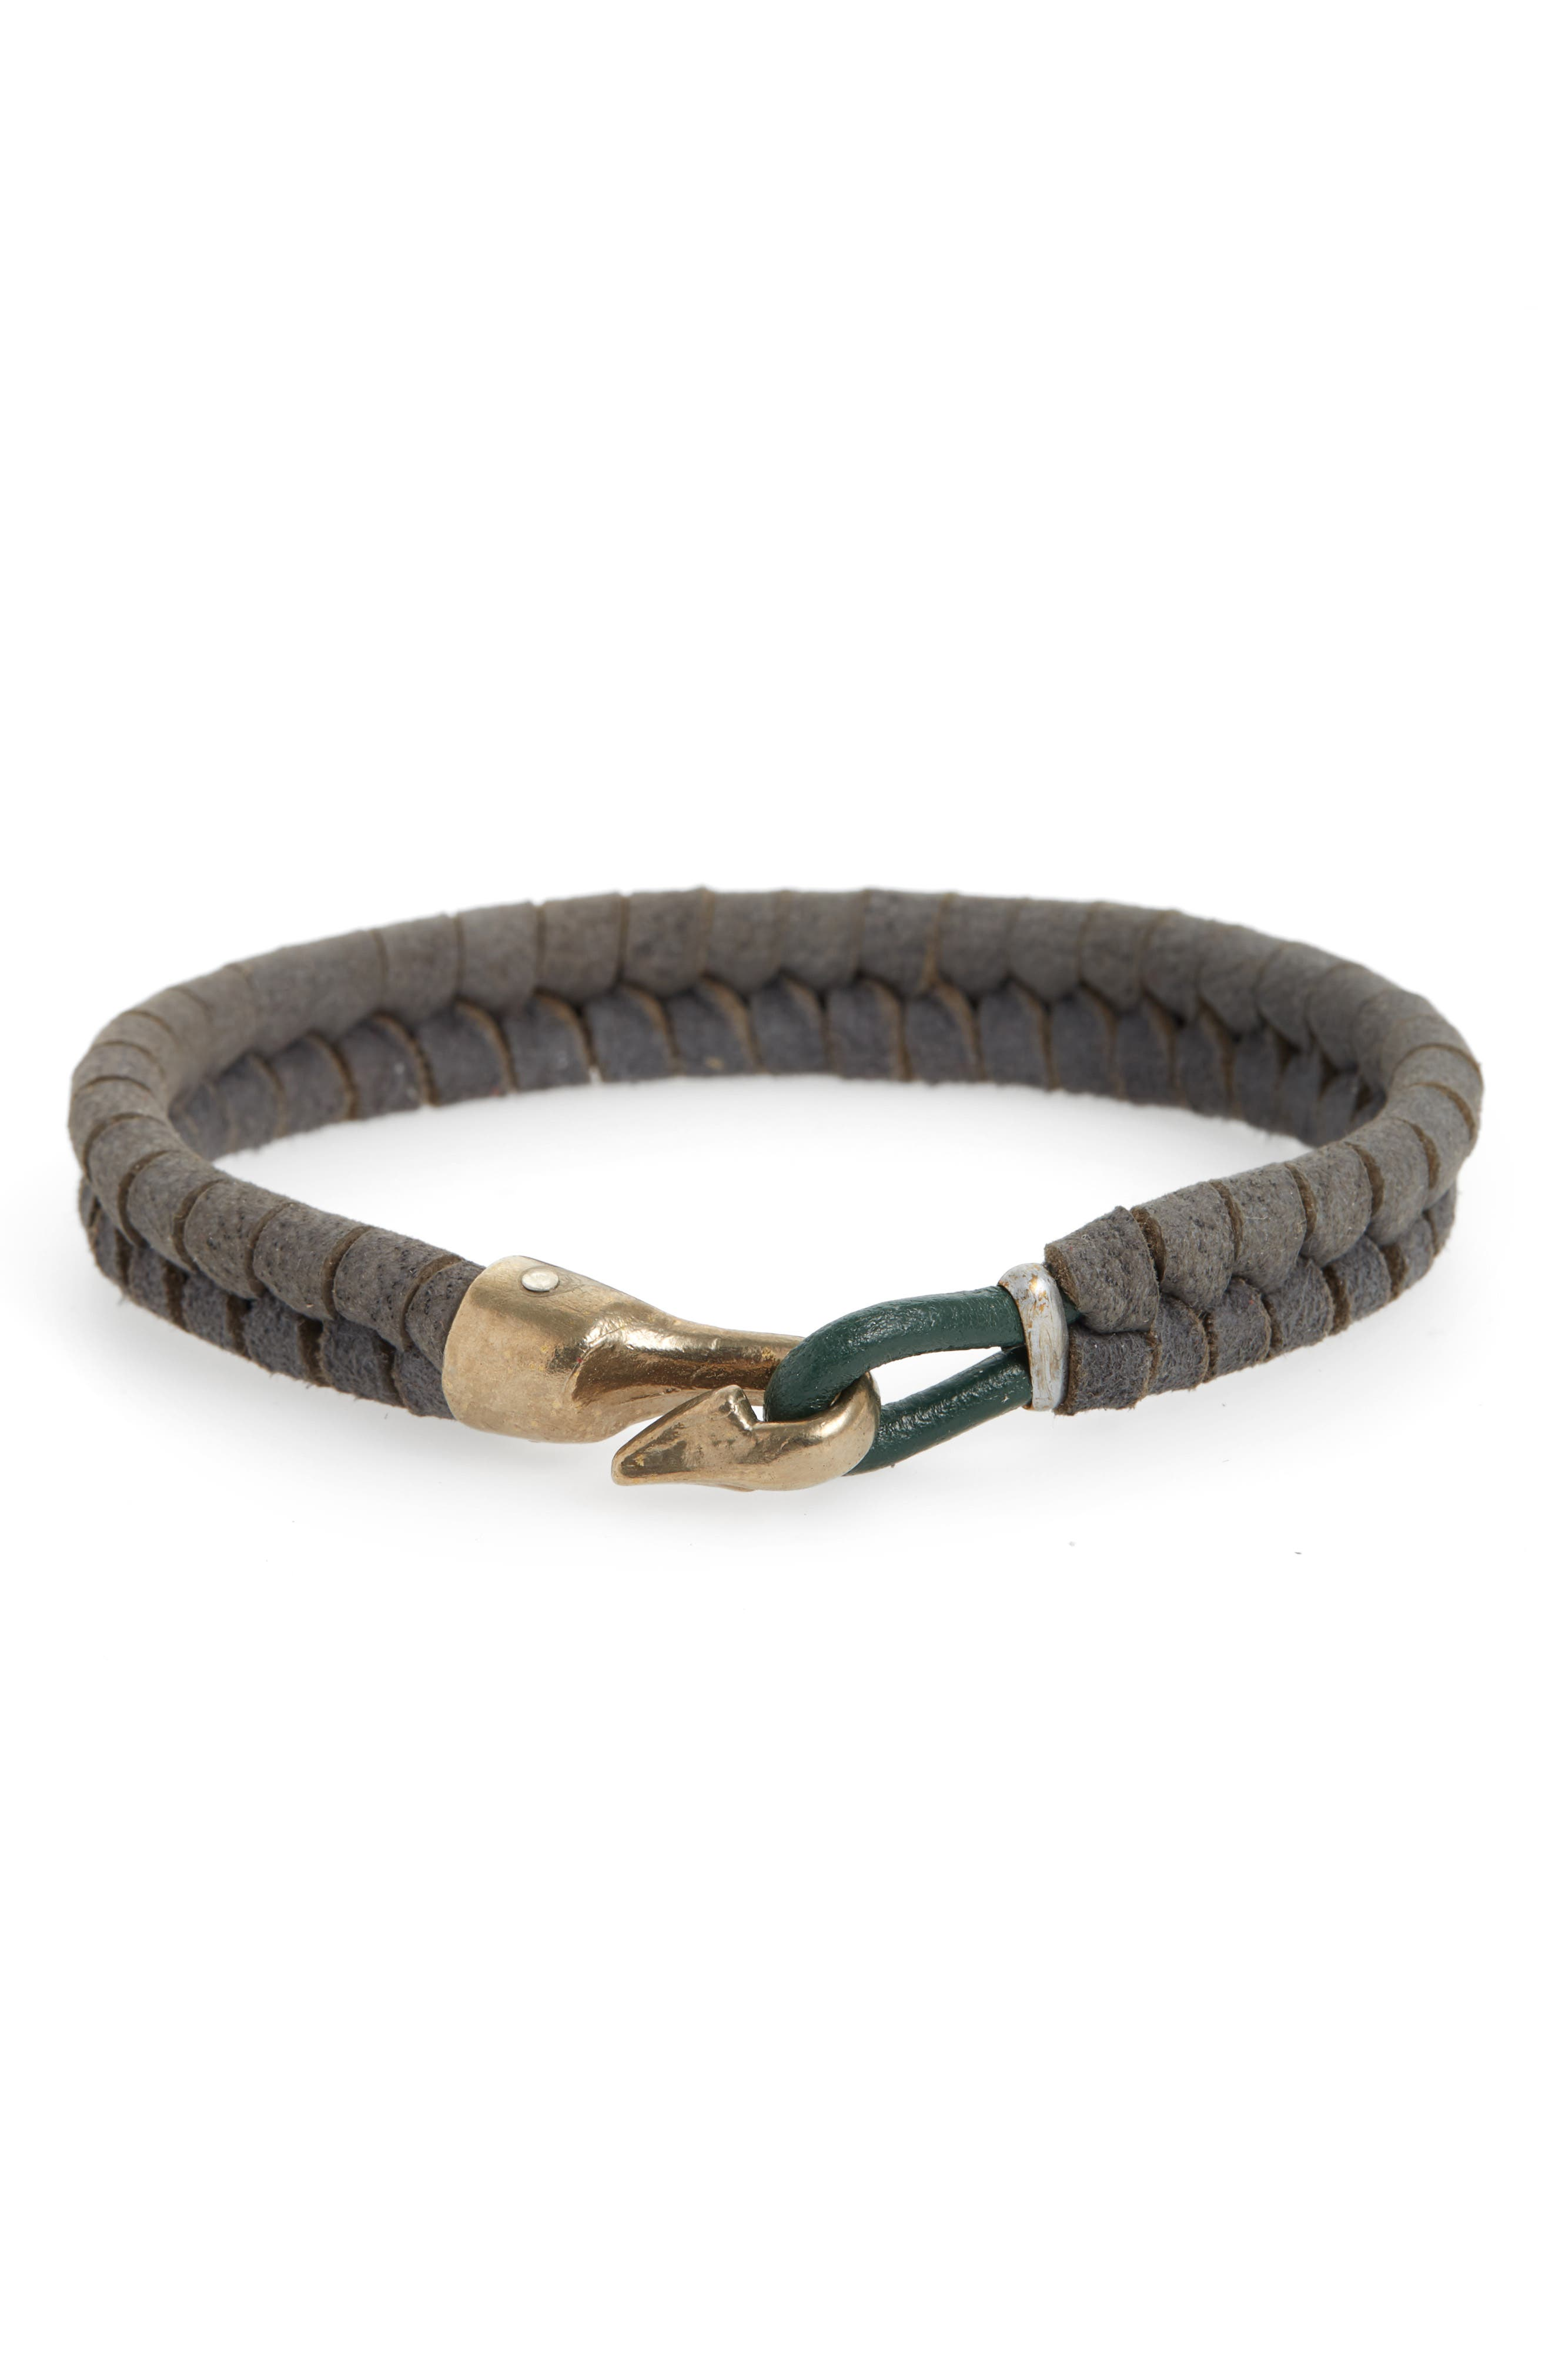 Harpoon Bracelet,                         Main,                         color, GREY